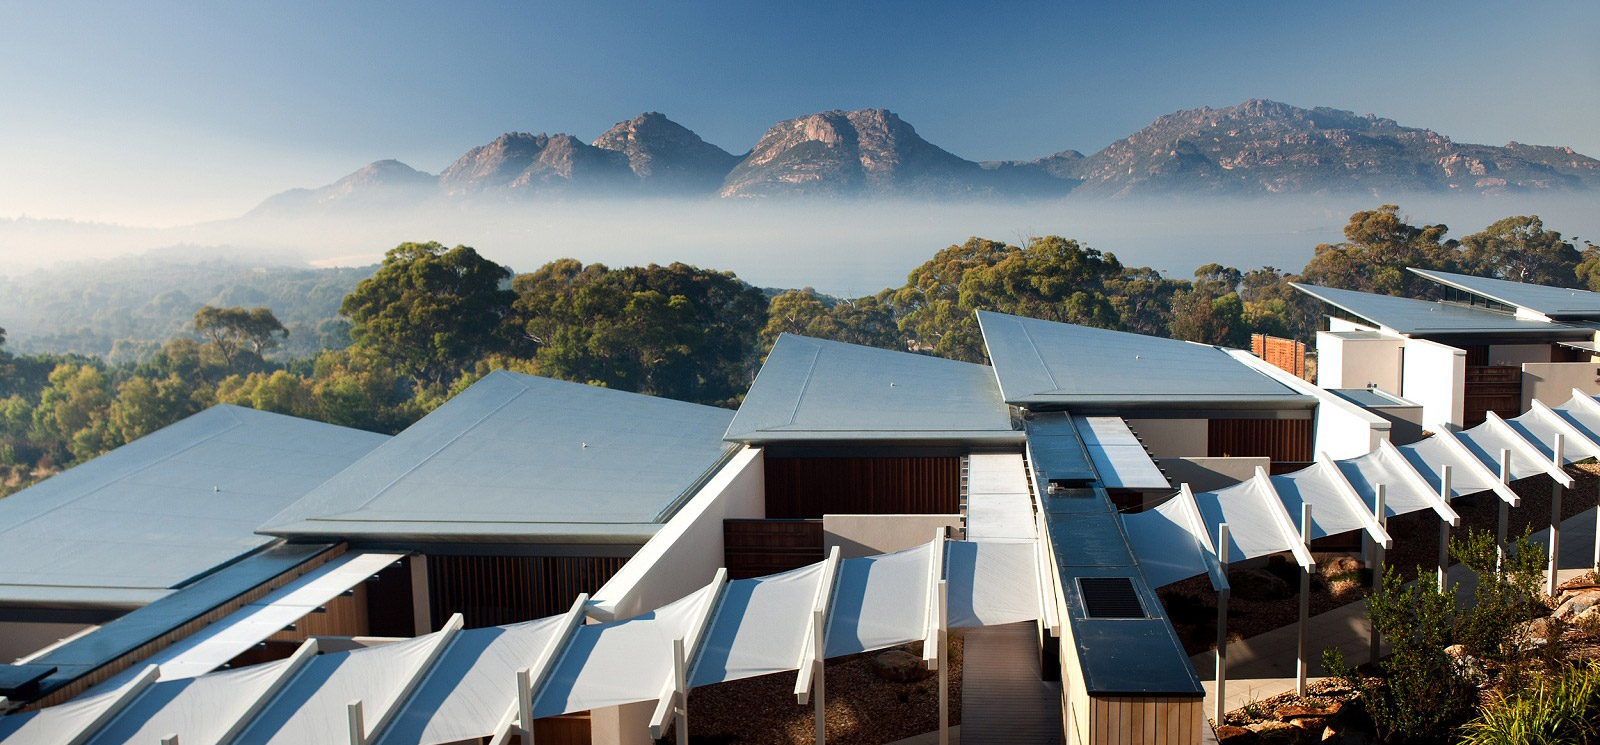 Saffire Freycinet - The Best Resort In Australia - The Lux ...